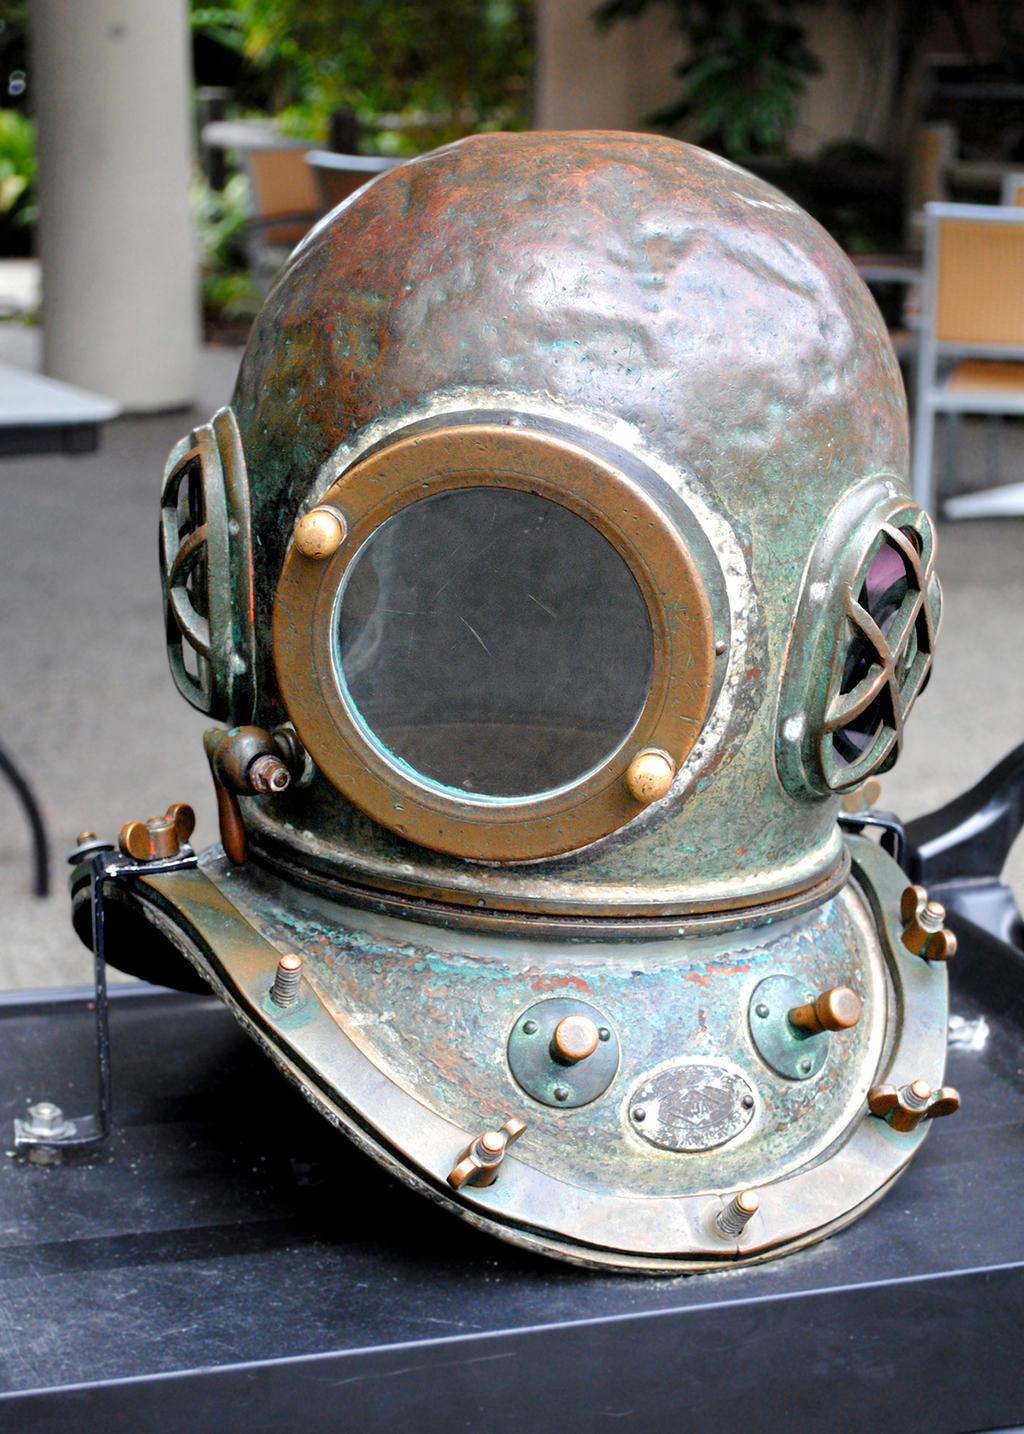 Lormet-Aquarium-0781-01sm by Lormet-Images